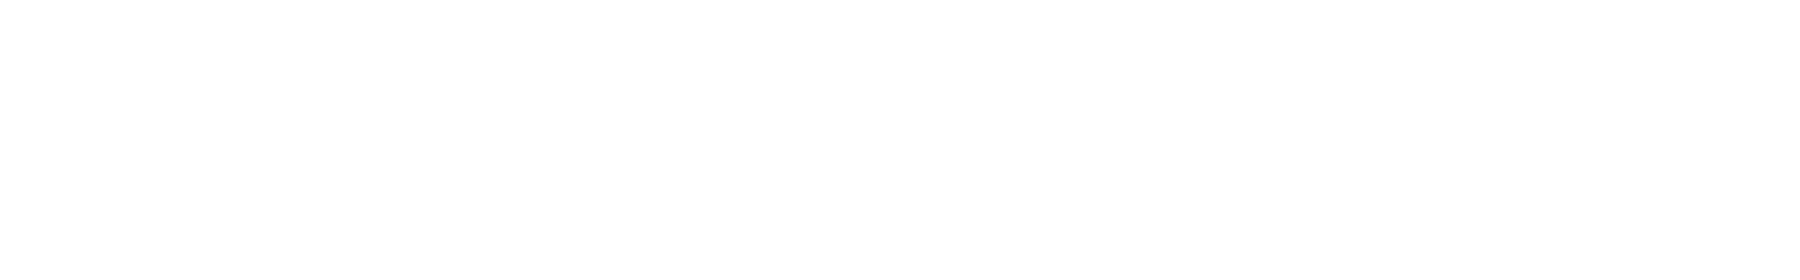 124542 minimal glitchy loop nokick 128bpm wav